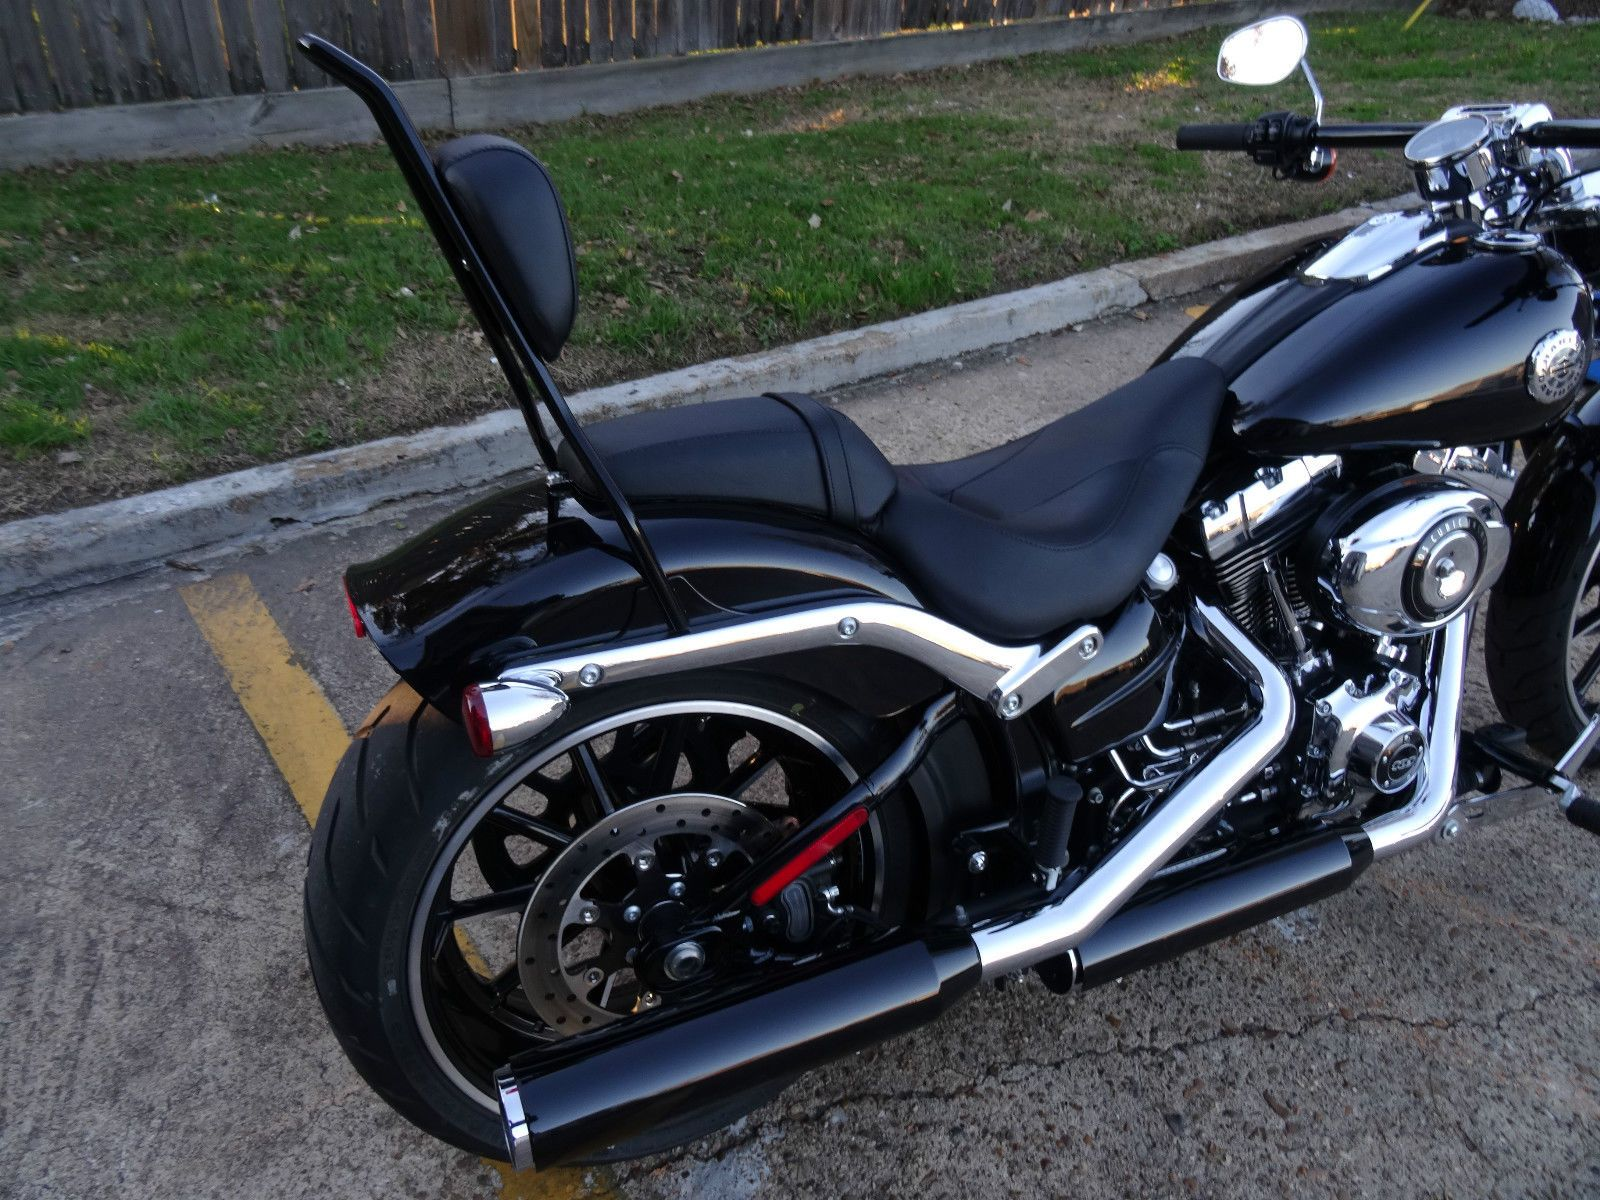 Harley Davidson 2013 2014 Breakout Sissy Bar